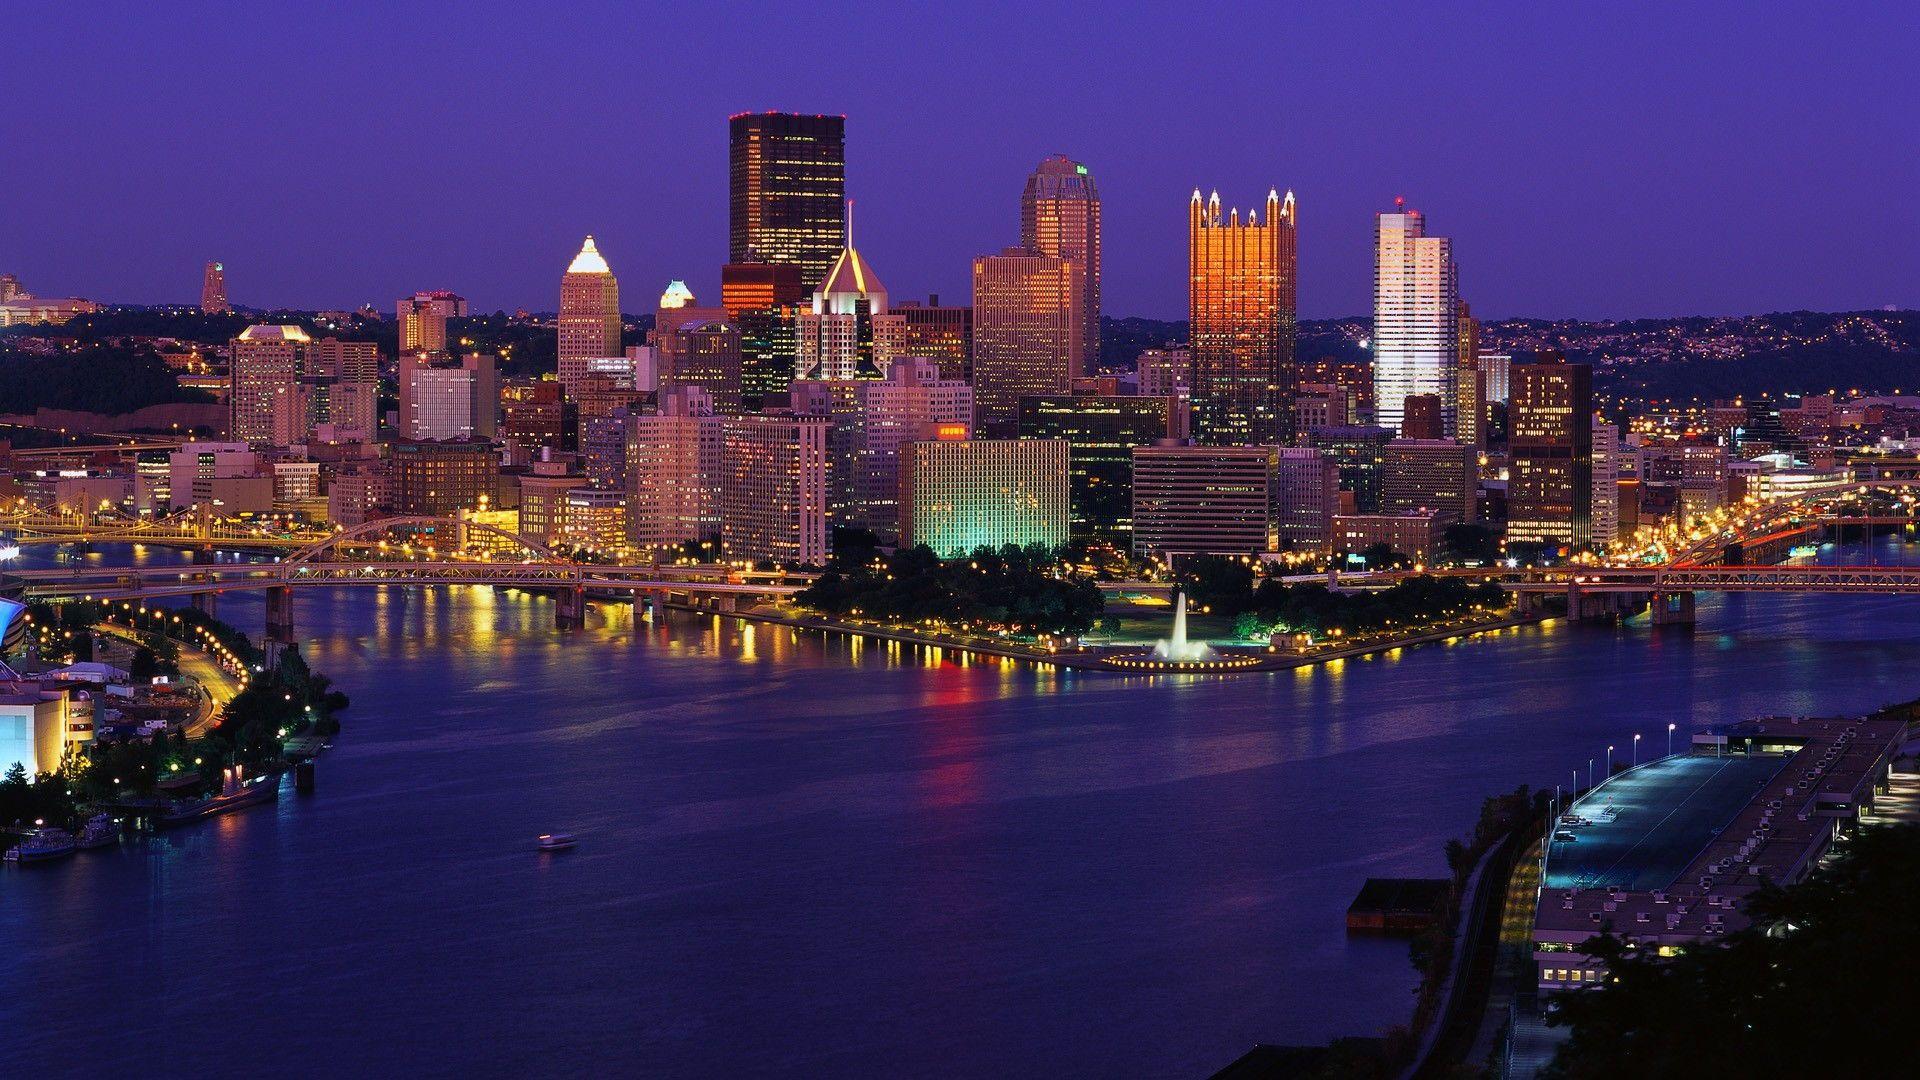 Pittsburgh Desktop Wallpaper Skyline: Pittsburgh Skyline At Night Wallpaper